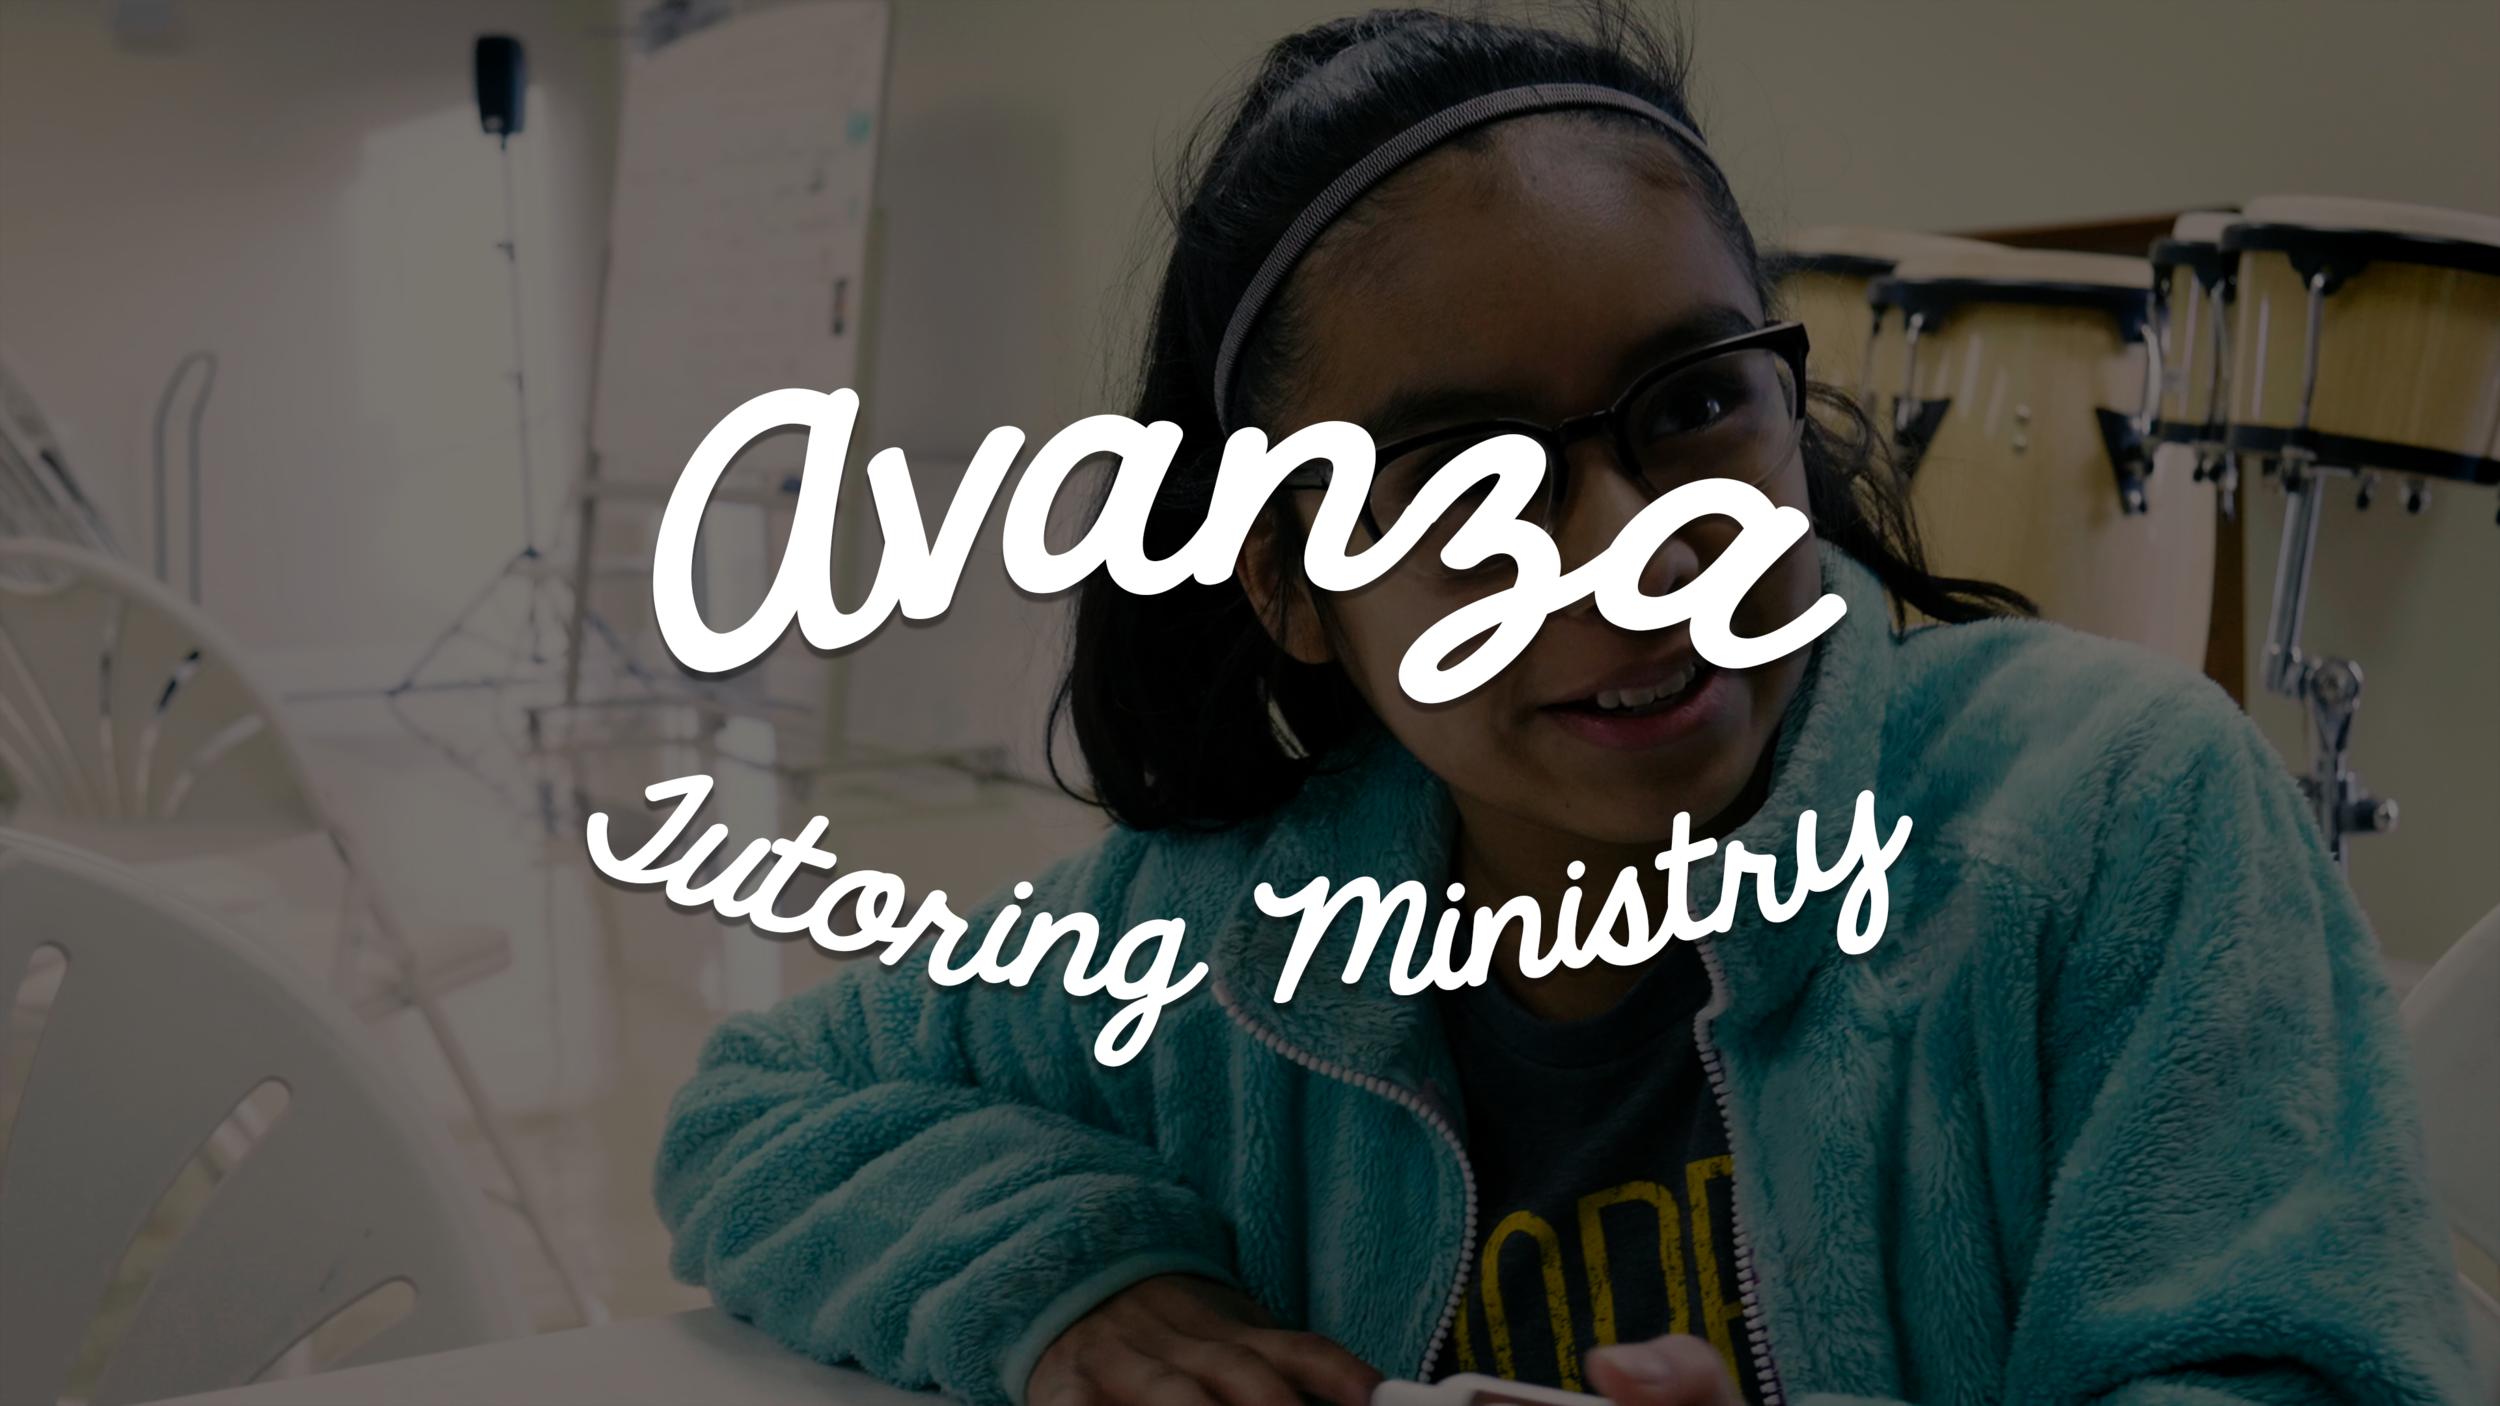 Avanza_1.8.2.png